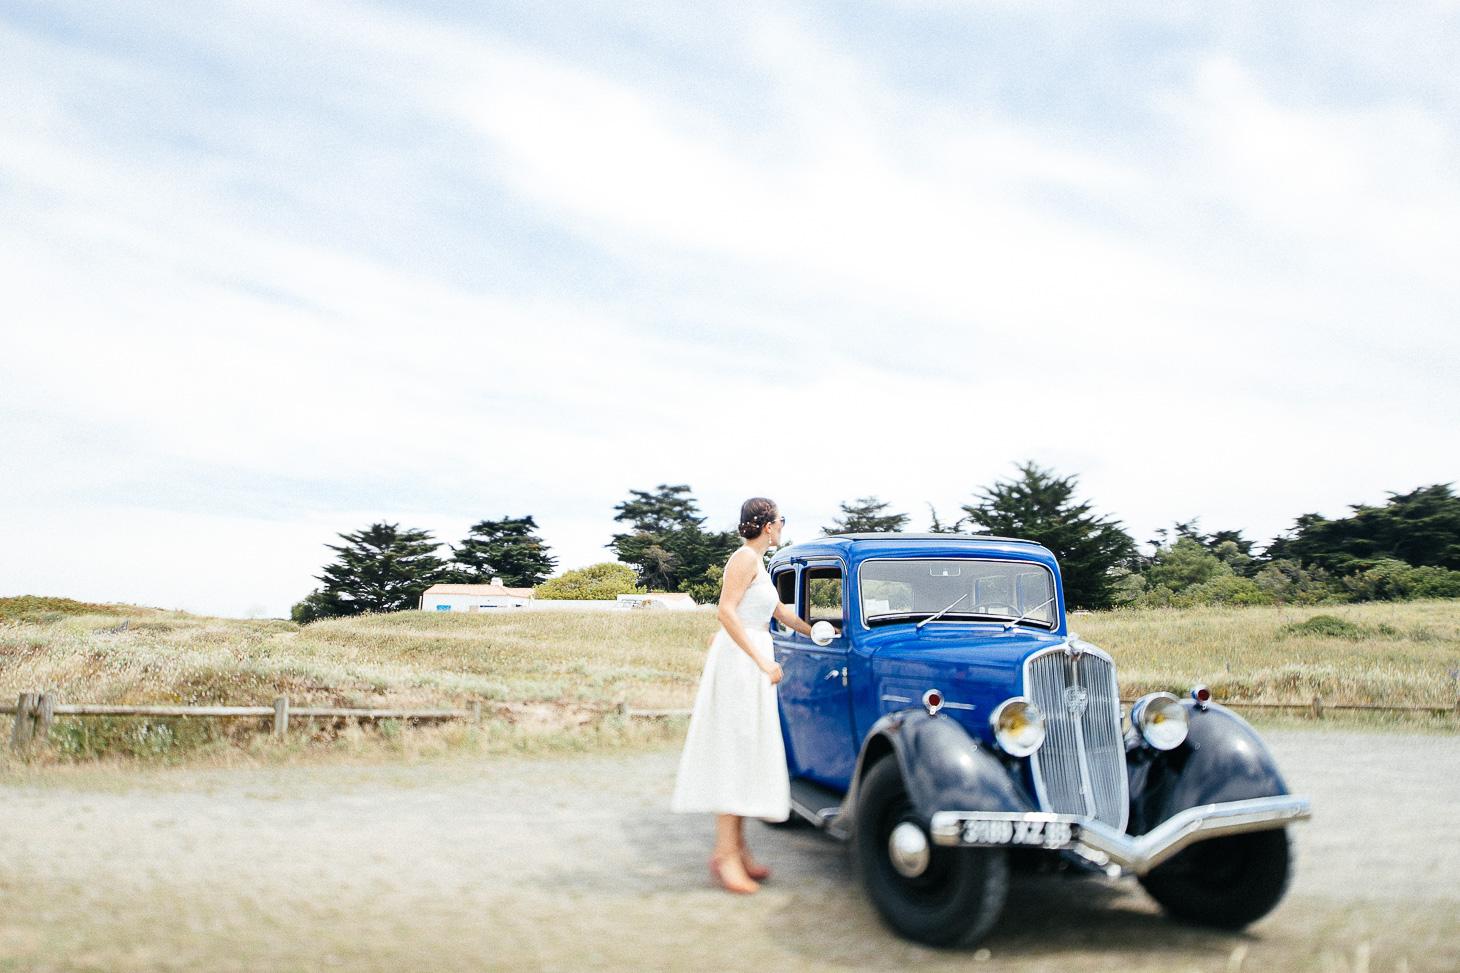 photographe-mariage-ile-d-yeu-0074